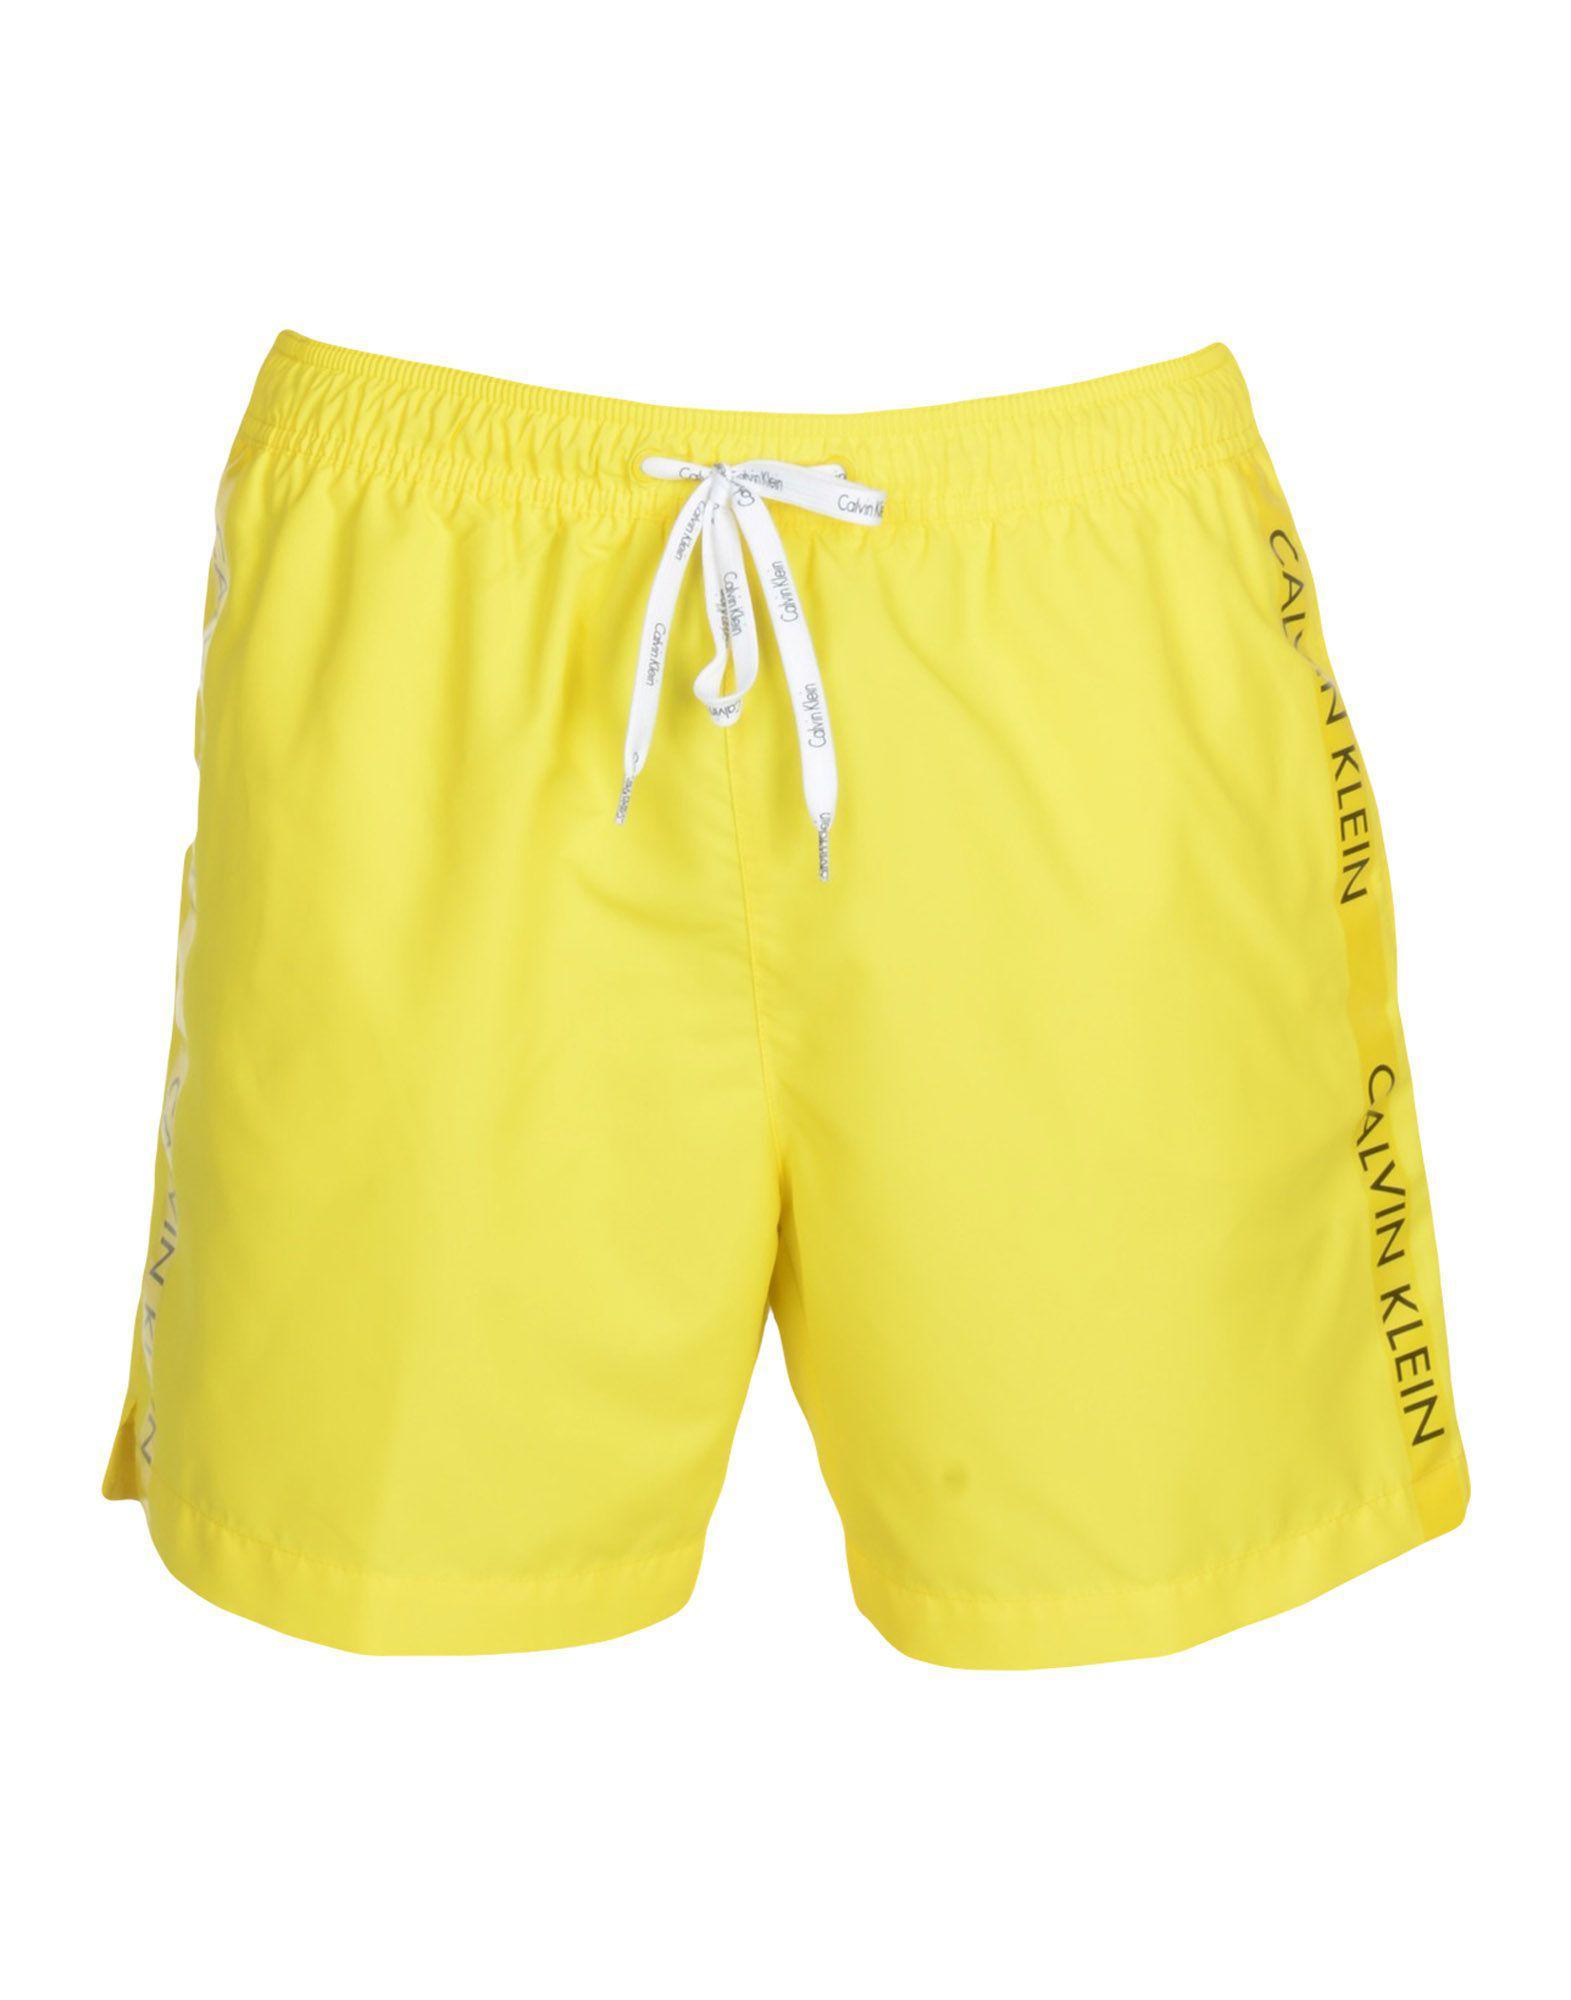 9dbedf3e1bf94 Calvin Klein Swimming Trunks in Yellow for Men - Lyst